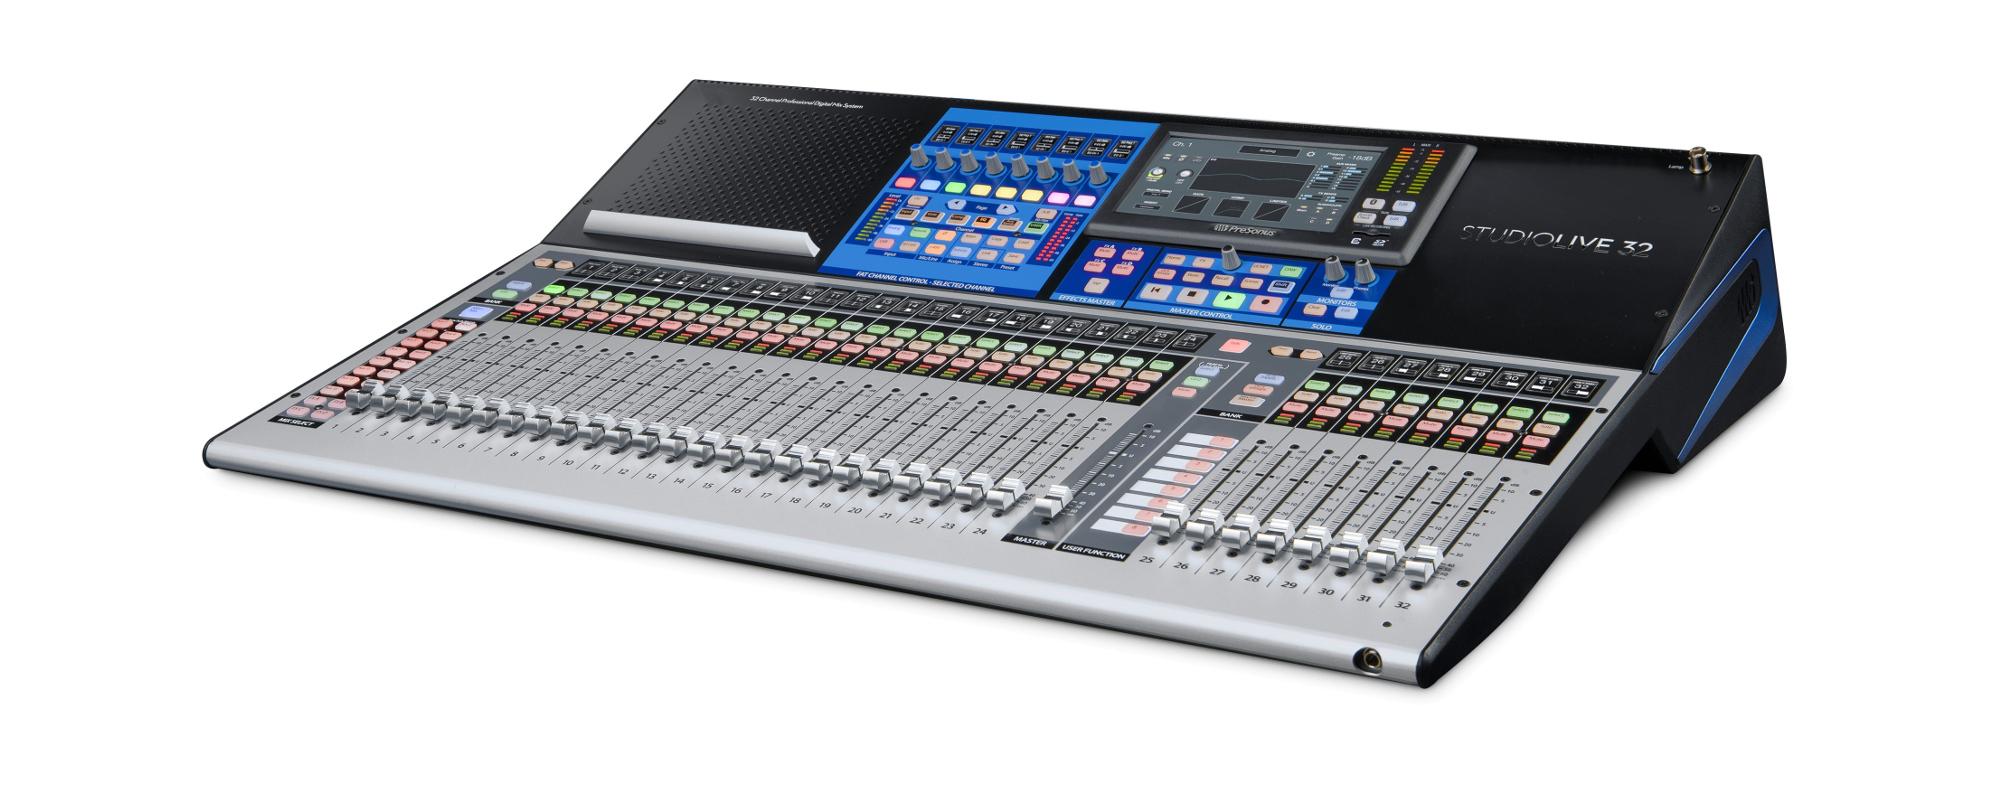 PreSonus StudioLive 32 40-Input Digital Console/Recorder with 33 Motorized Faders STUDIOLIVE-32